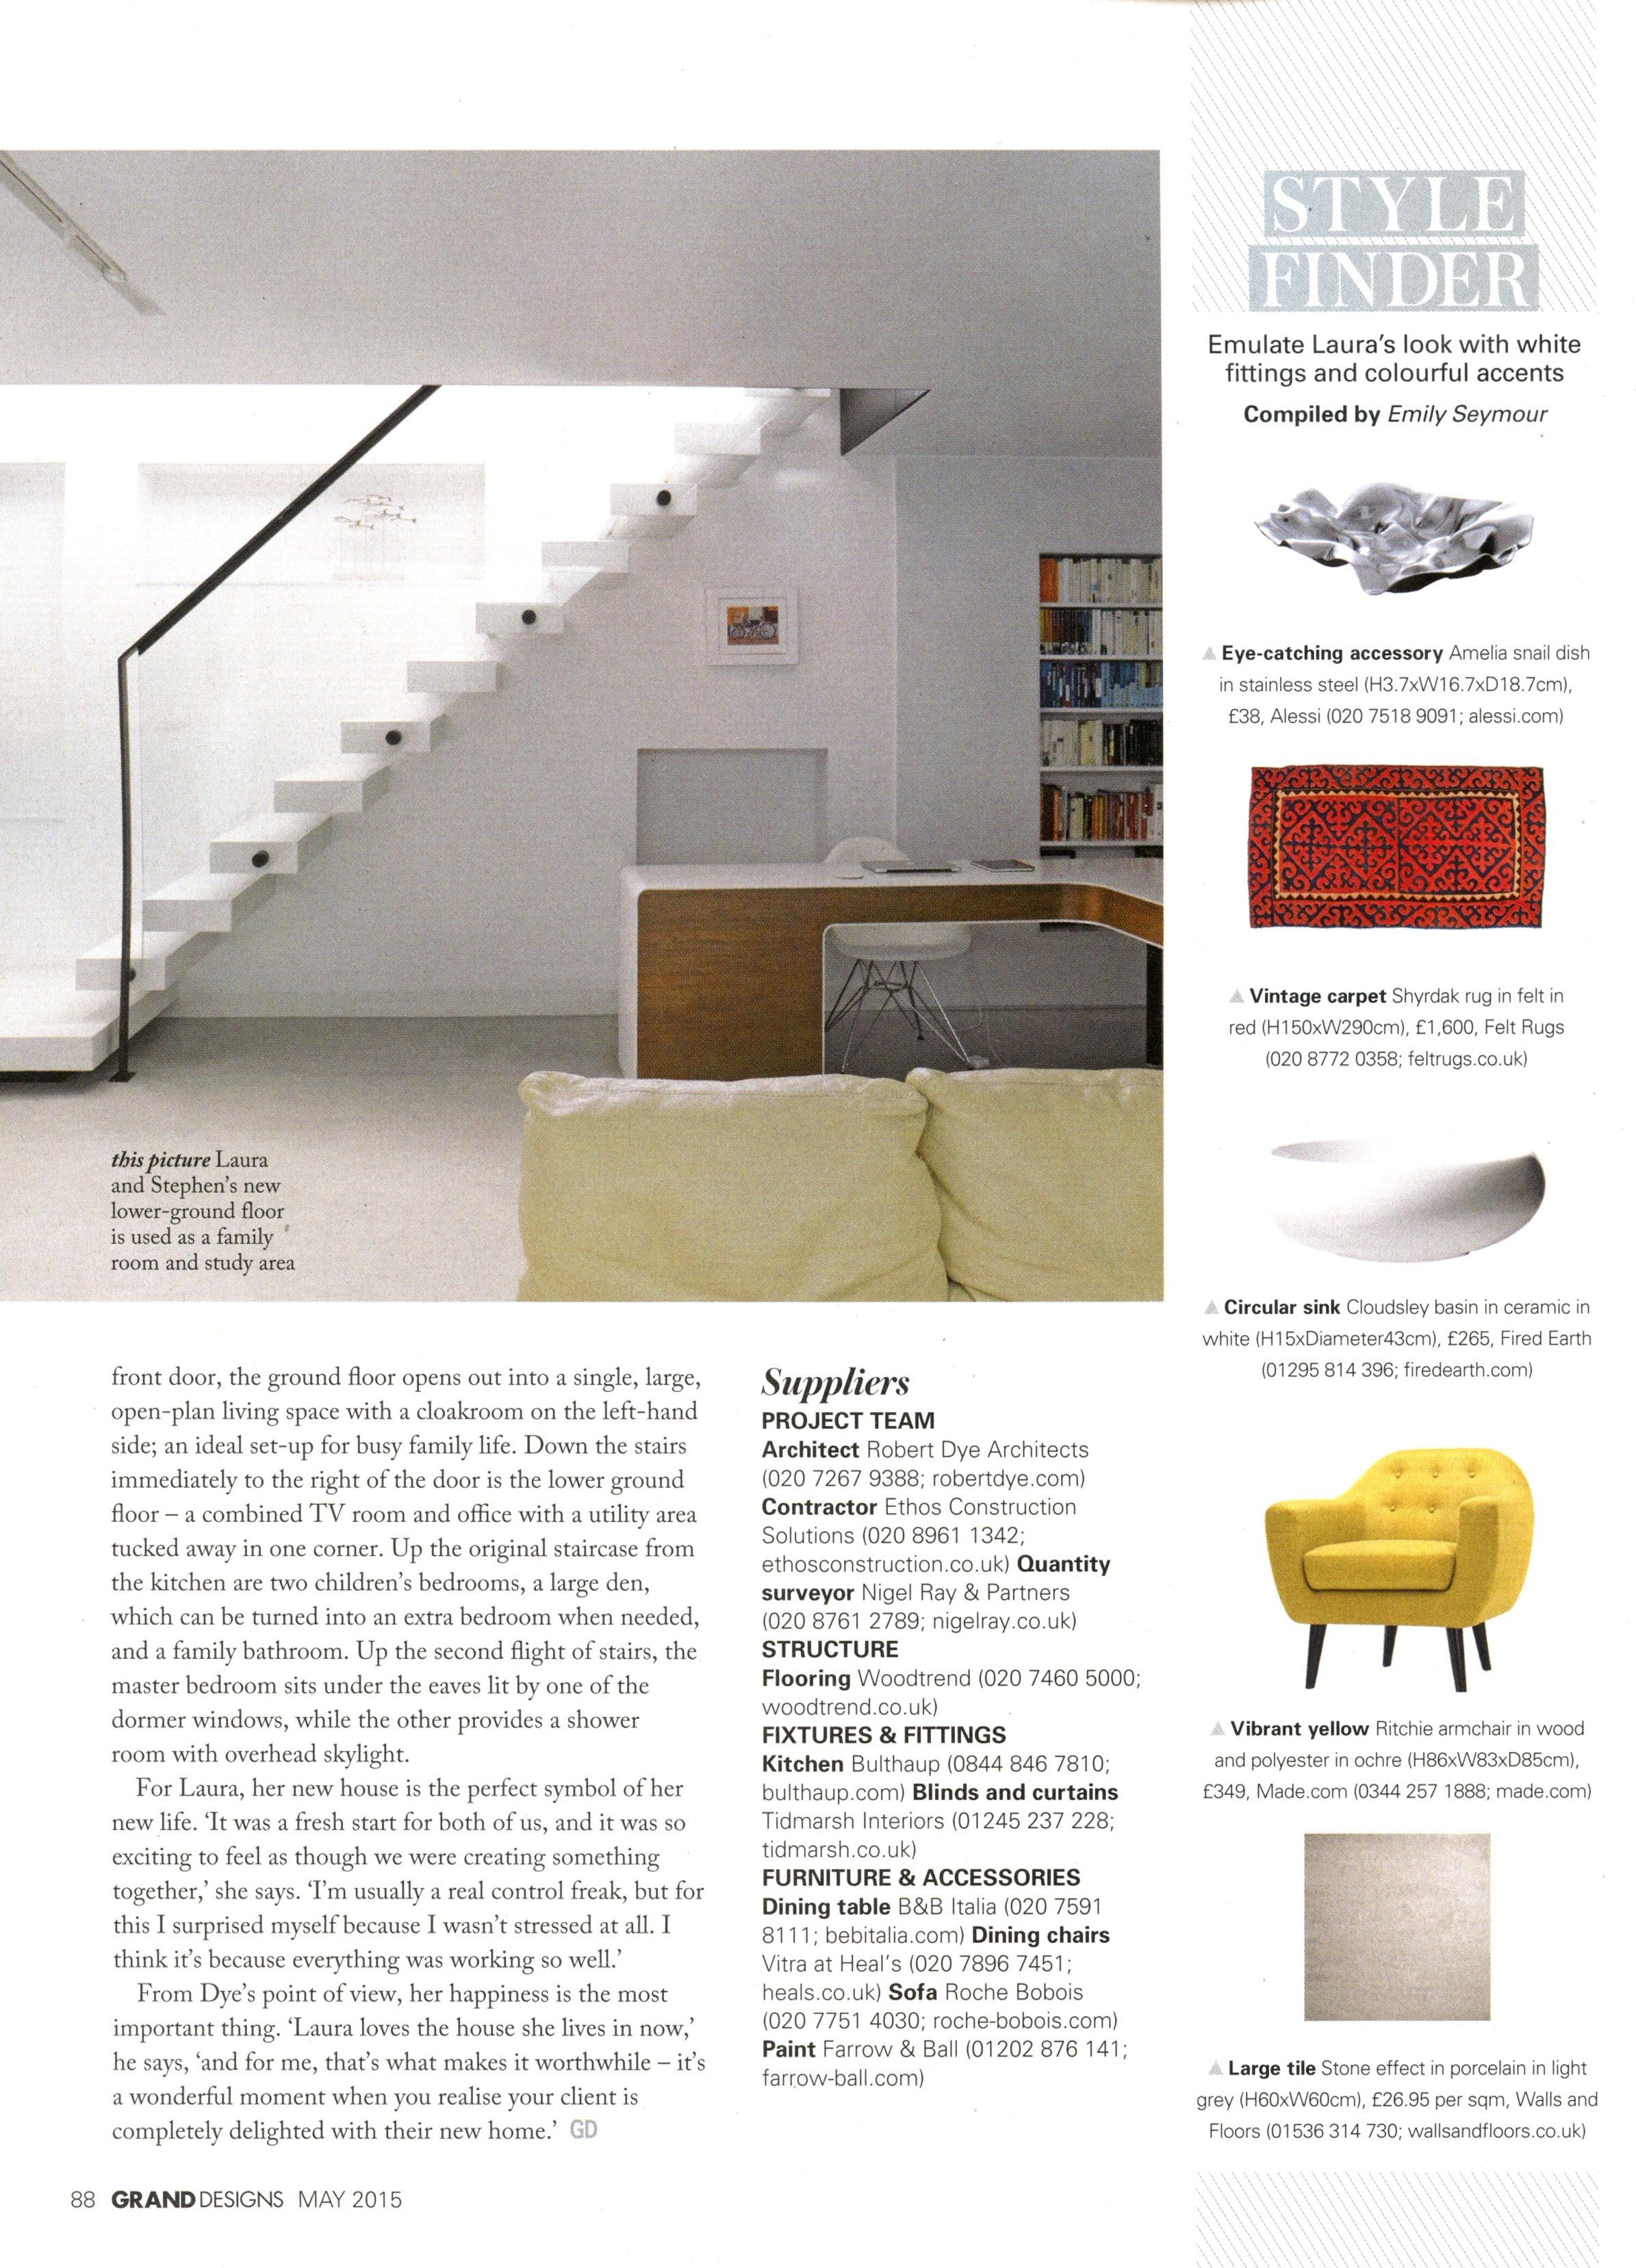 Style finder featuring a vintage Shyrdak rug from Felt feltrugs.co.uk Grand Designs May 2015